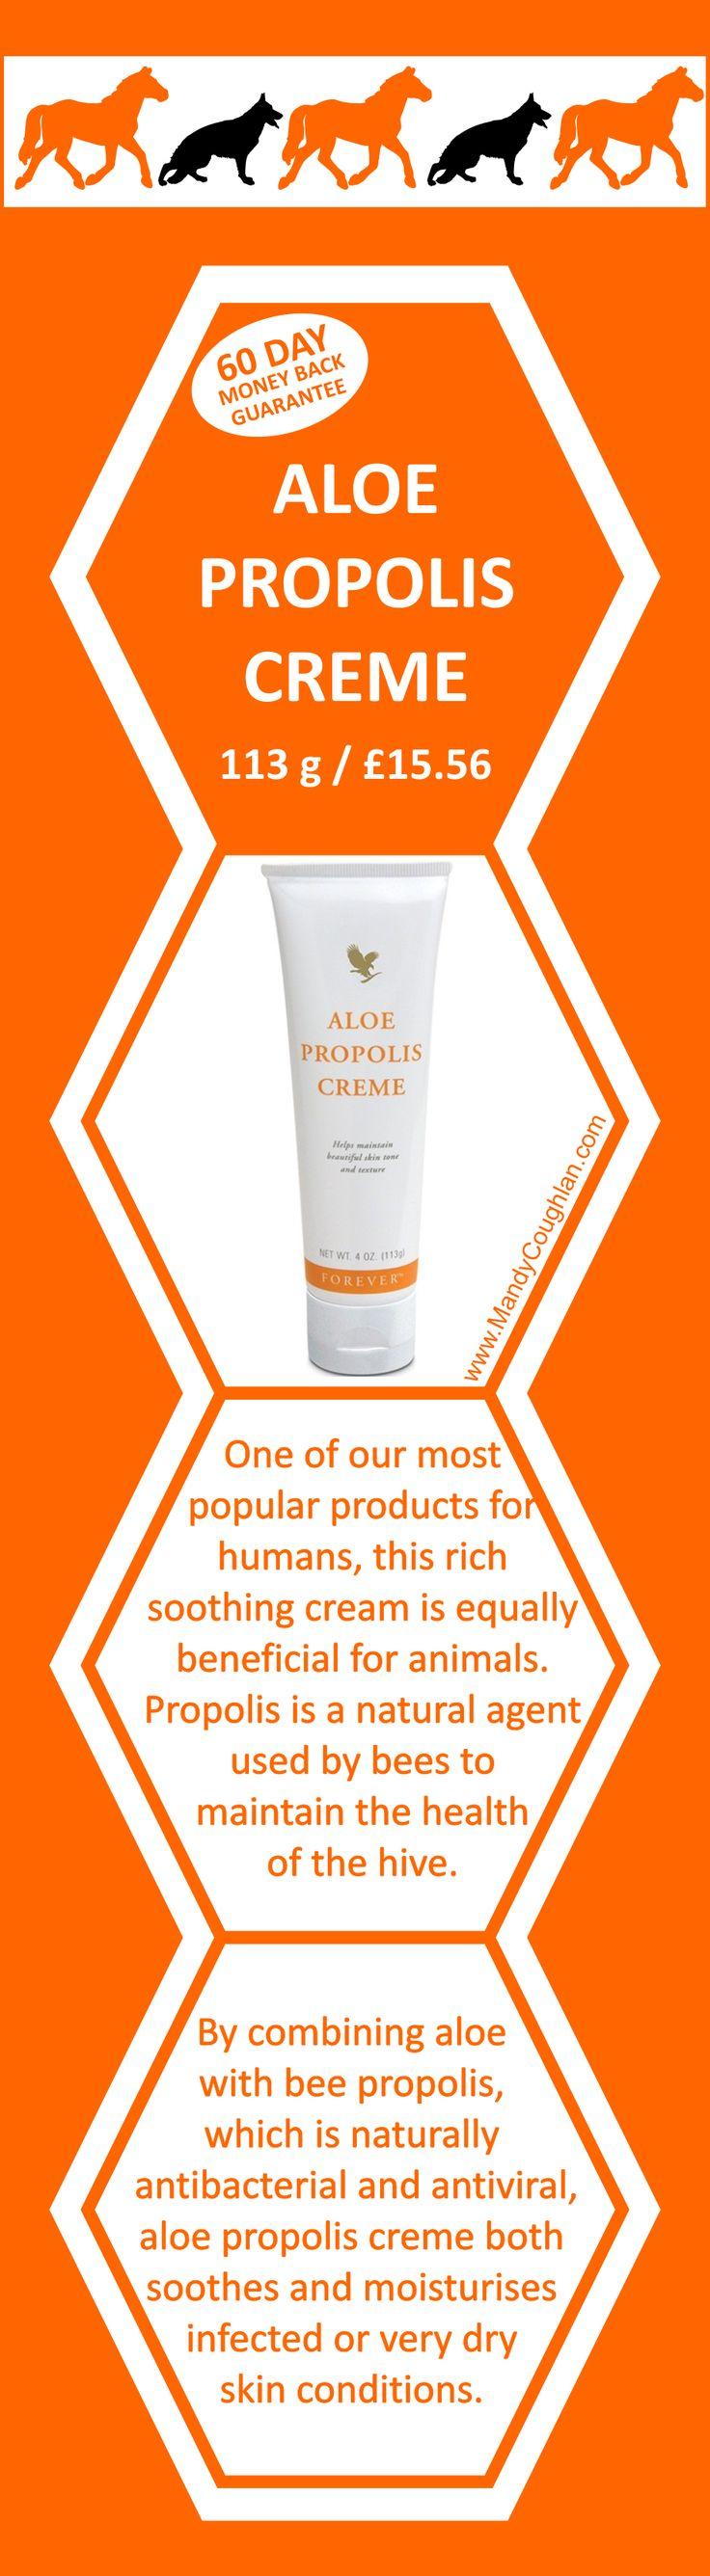 Aloe Propolis Creme,  http://myaloevera.se/evarosendahlshop/sv/shop/category/hud/product/aloe_propolis_creme